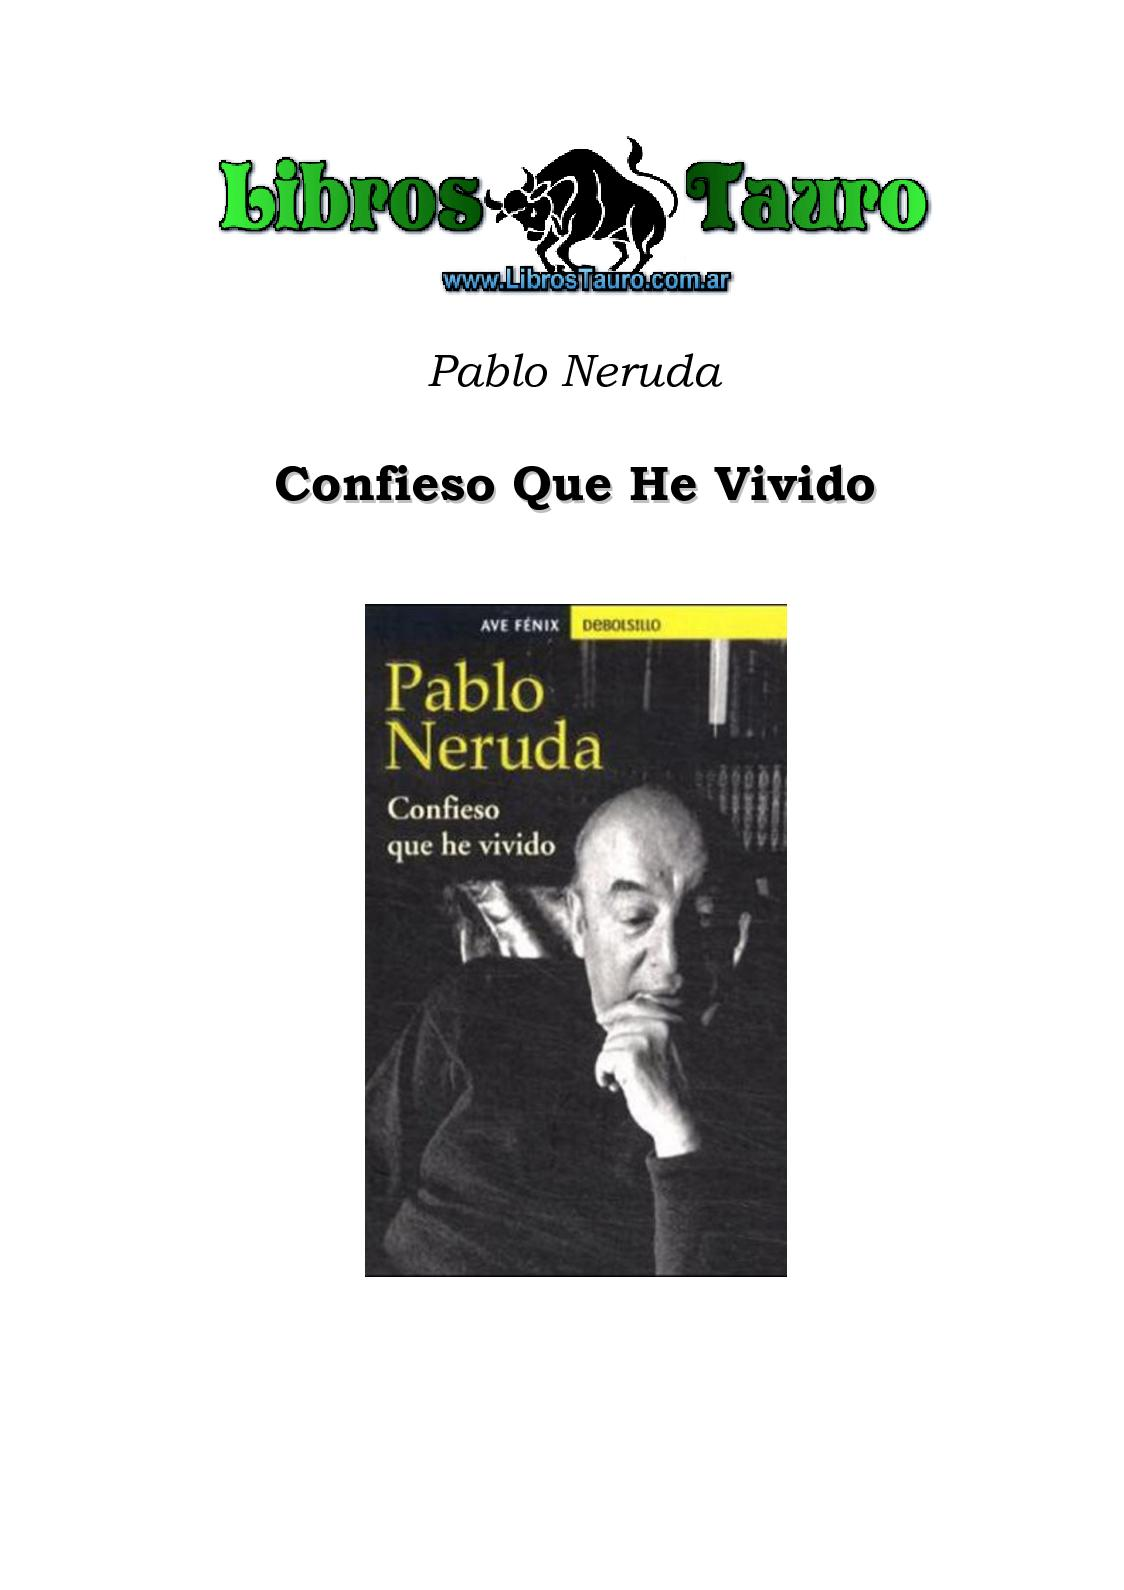 Calaméo - Neruda, Pablo - Confieso Que He Vivido